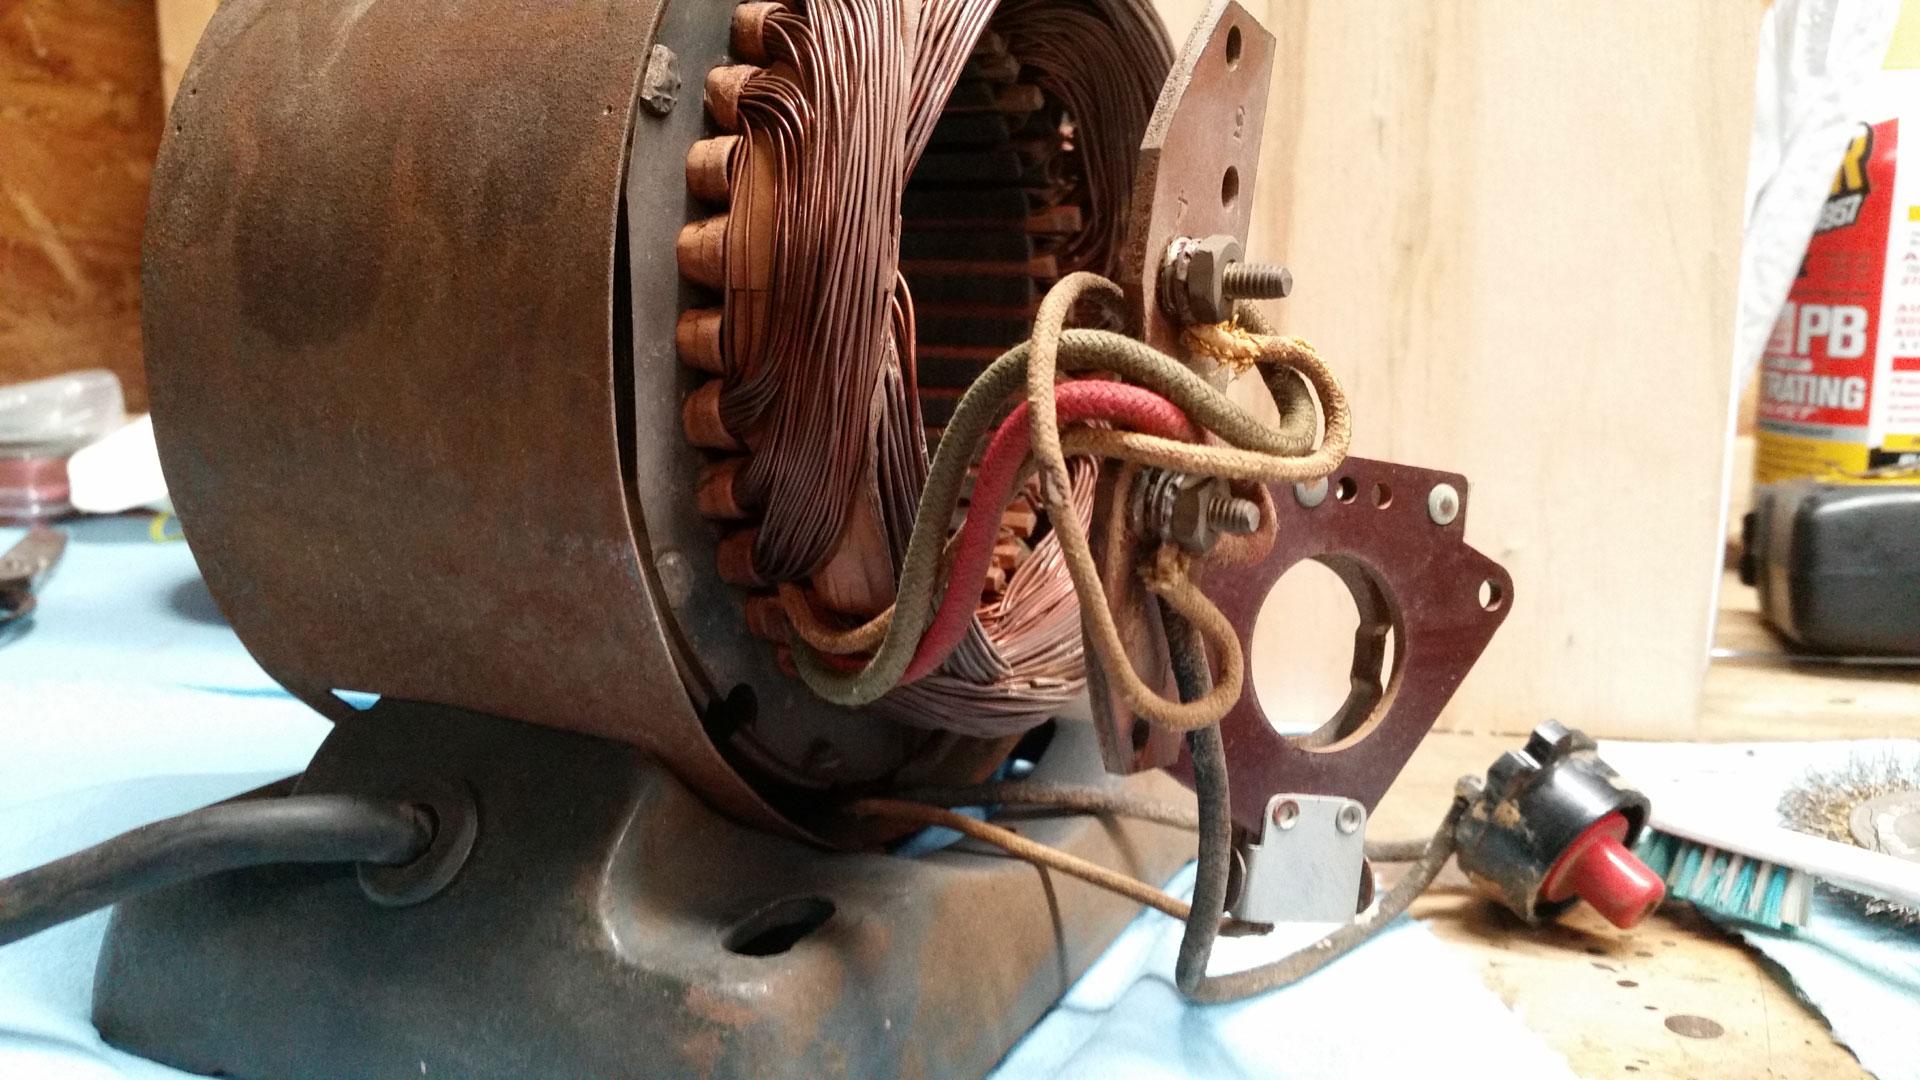 Craftsman 115.6962 Motor Restoration [part 2] – Michael ... on